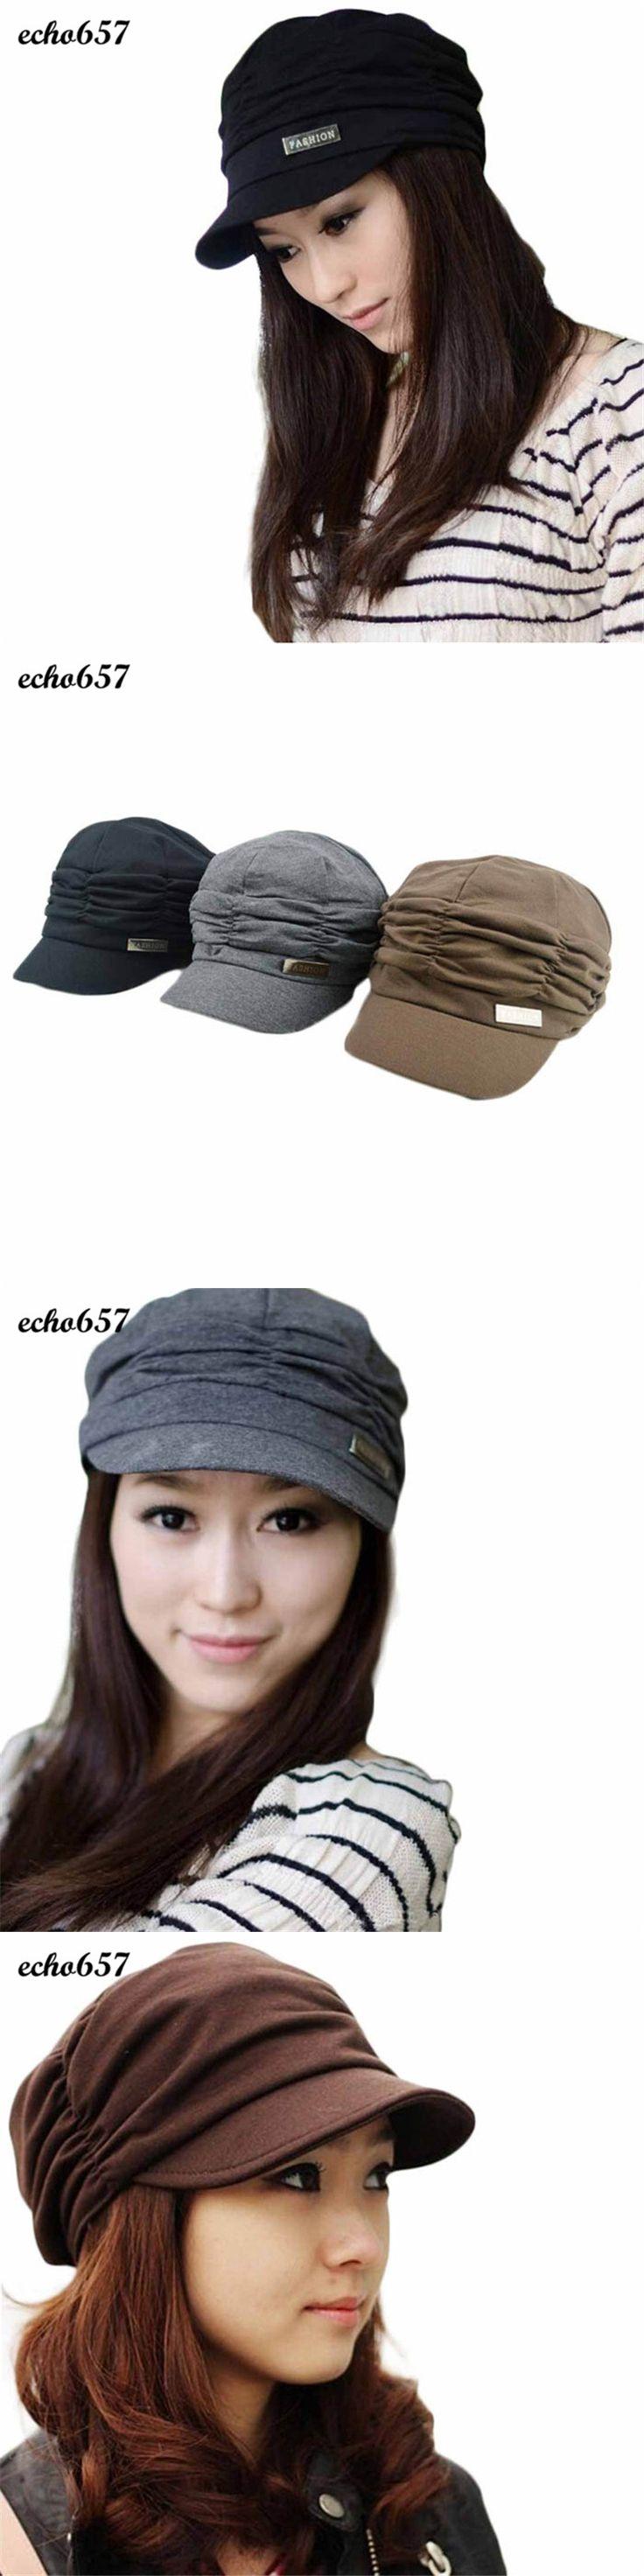 Hot Sale Military Caps Echo657 New Fashion Unisex Bouffancy Unisex Army Military Cap Flat -Top Hat Student Hat Vintag Cap Dec 22